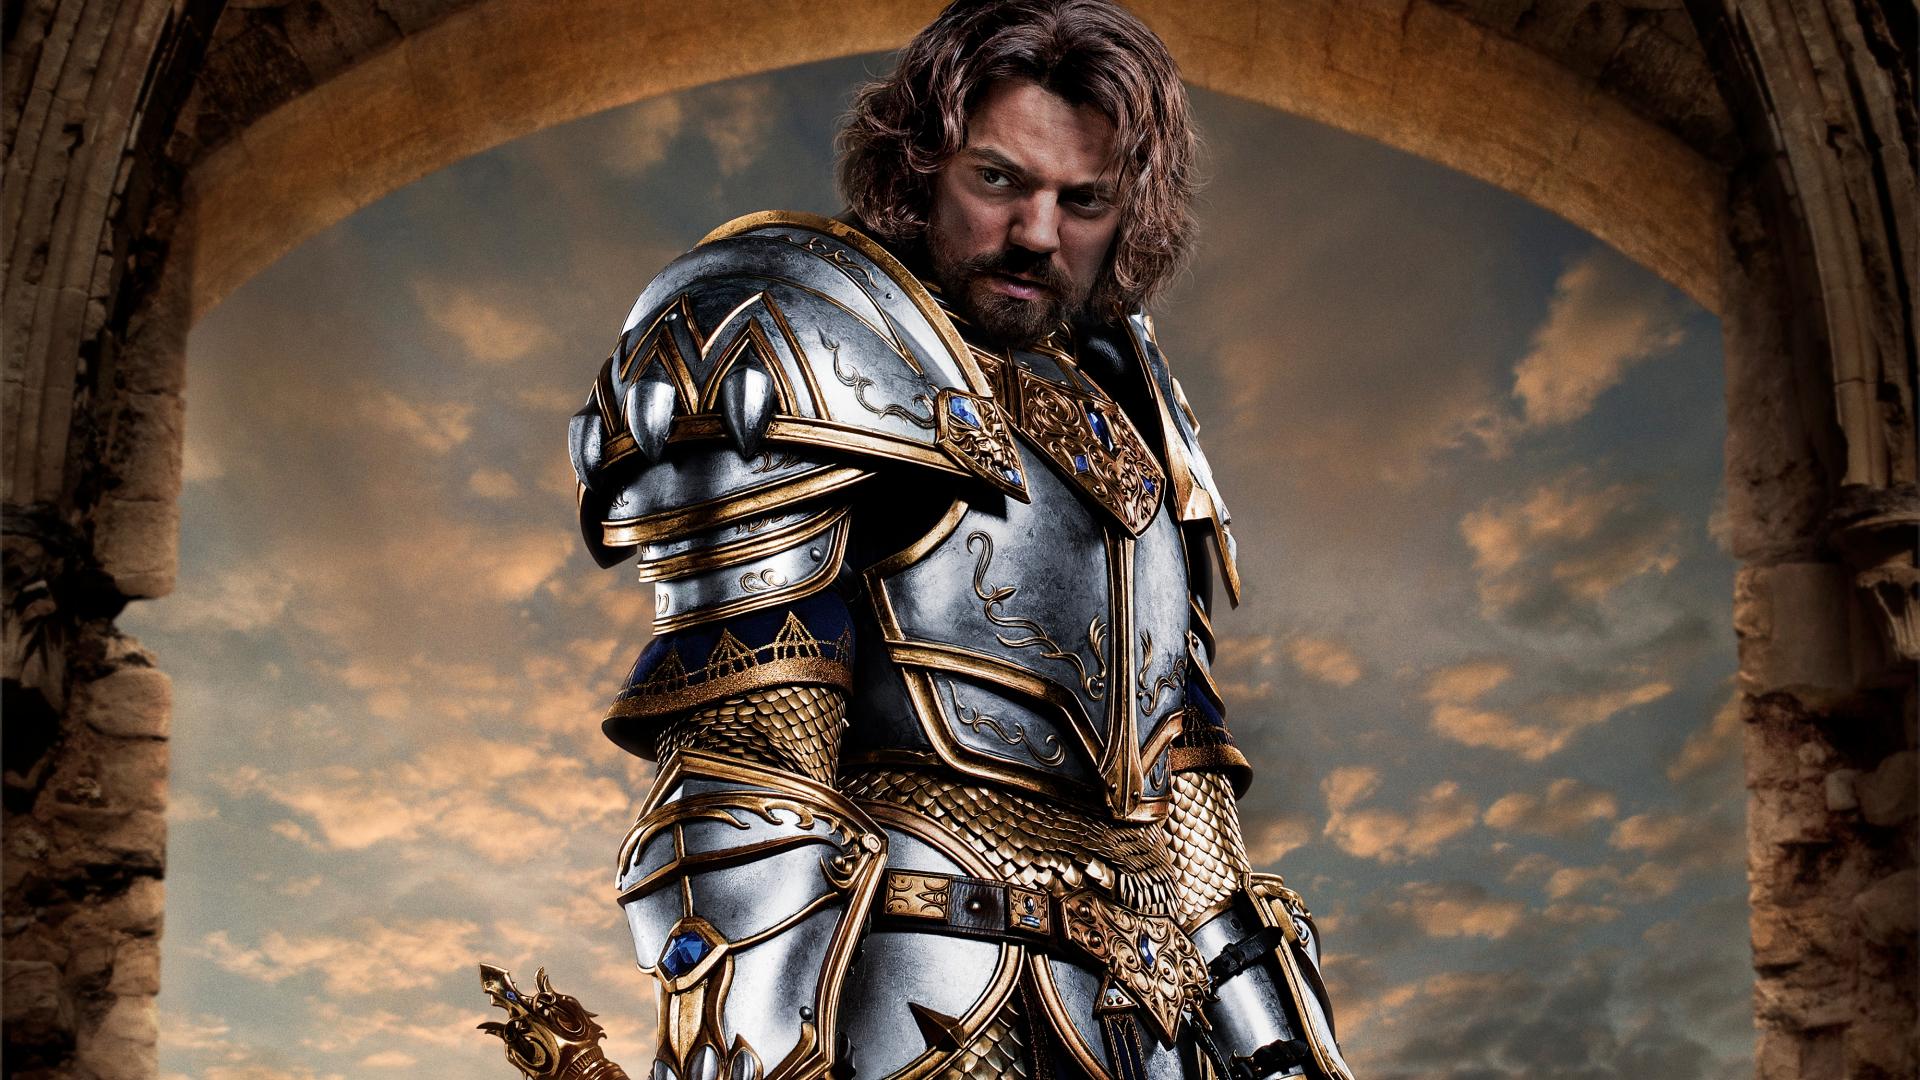 Warcraft Movie Wallpaper Warcraft 2016 Wallpaper